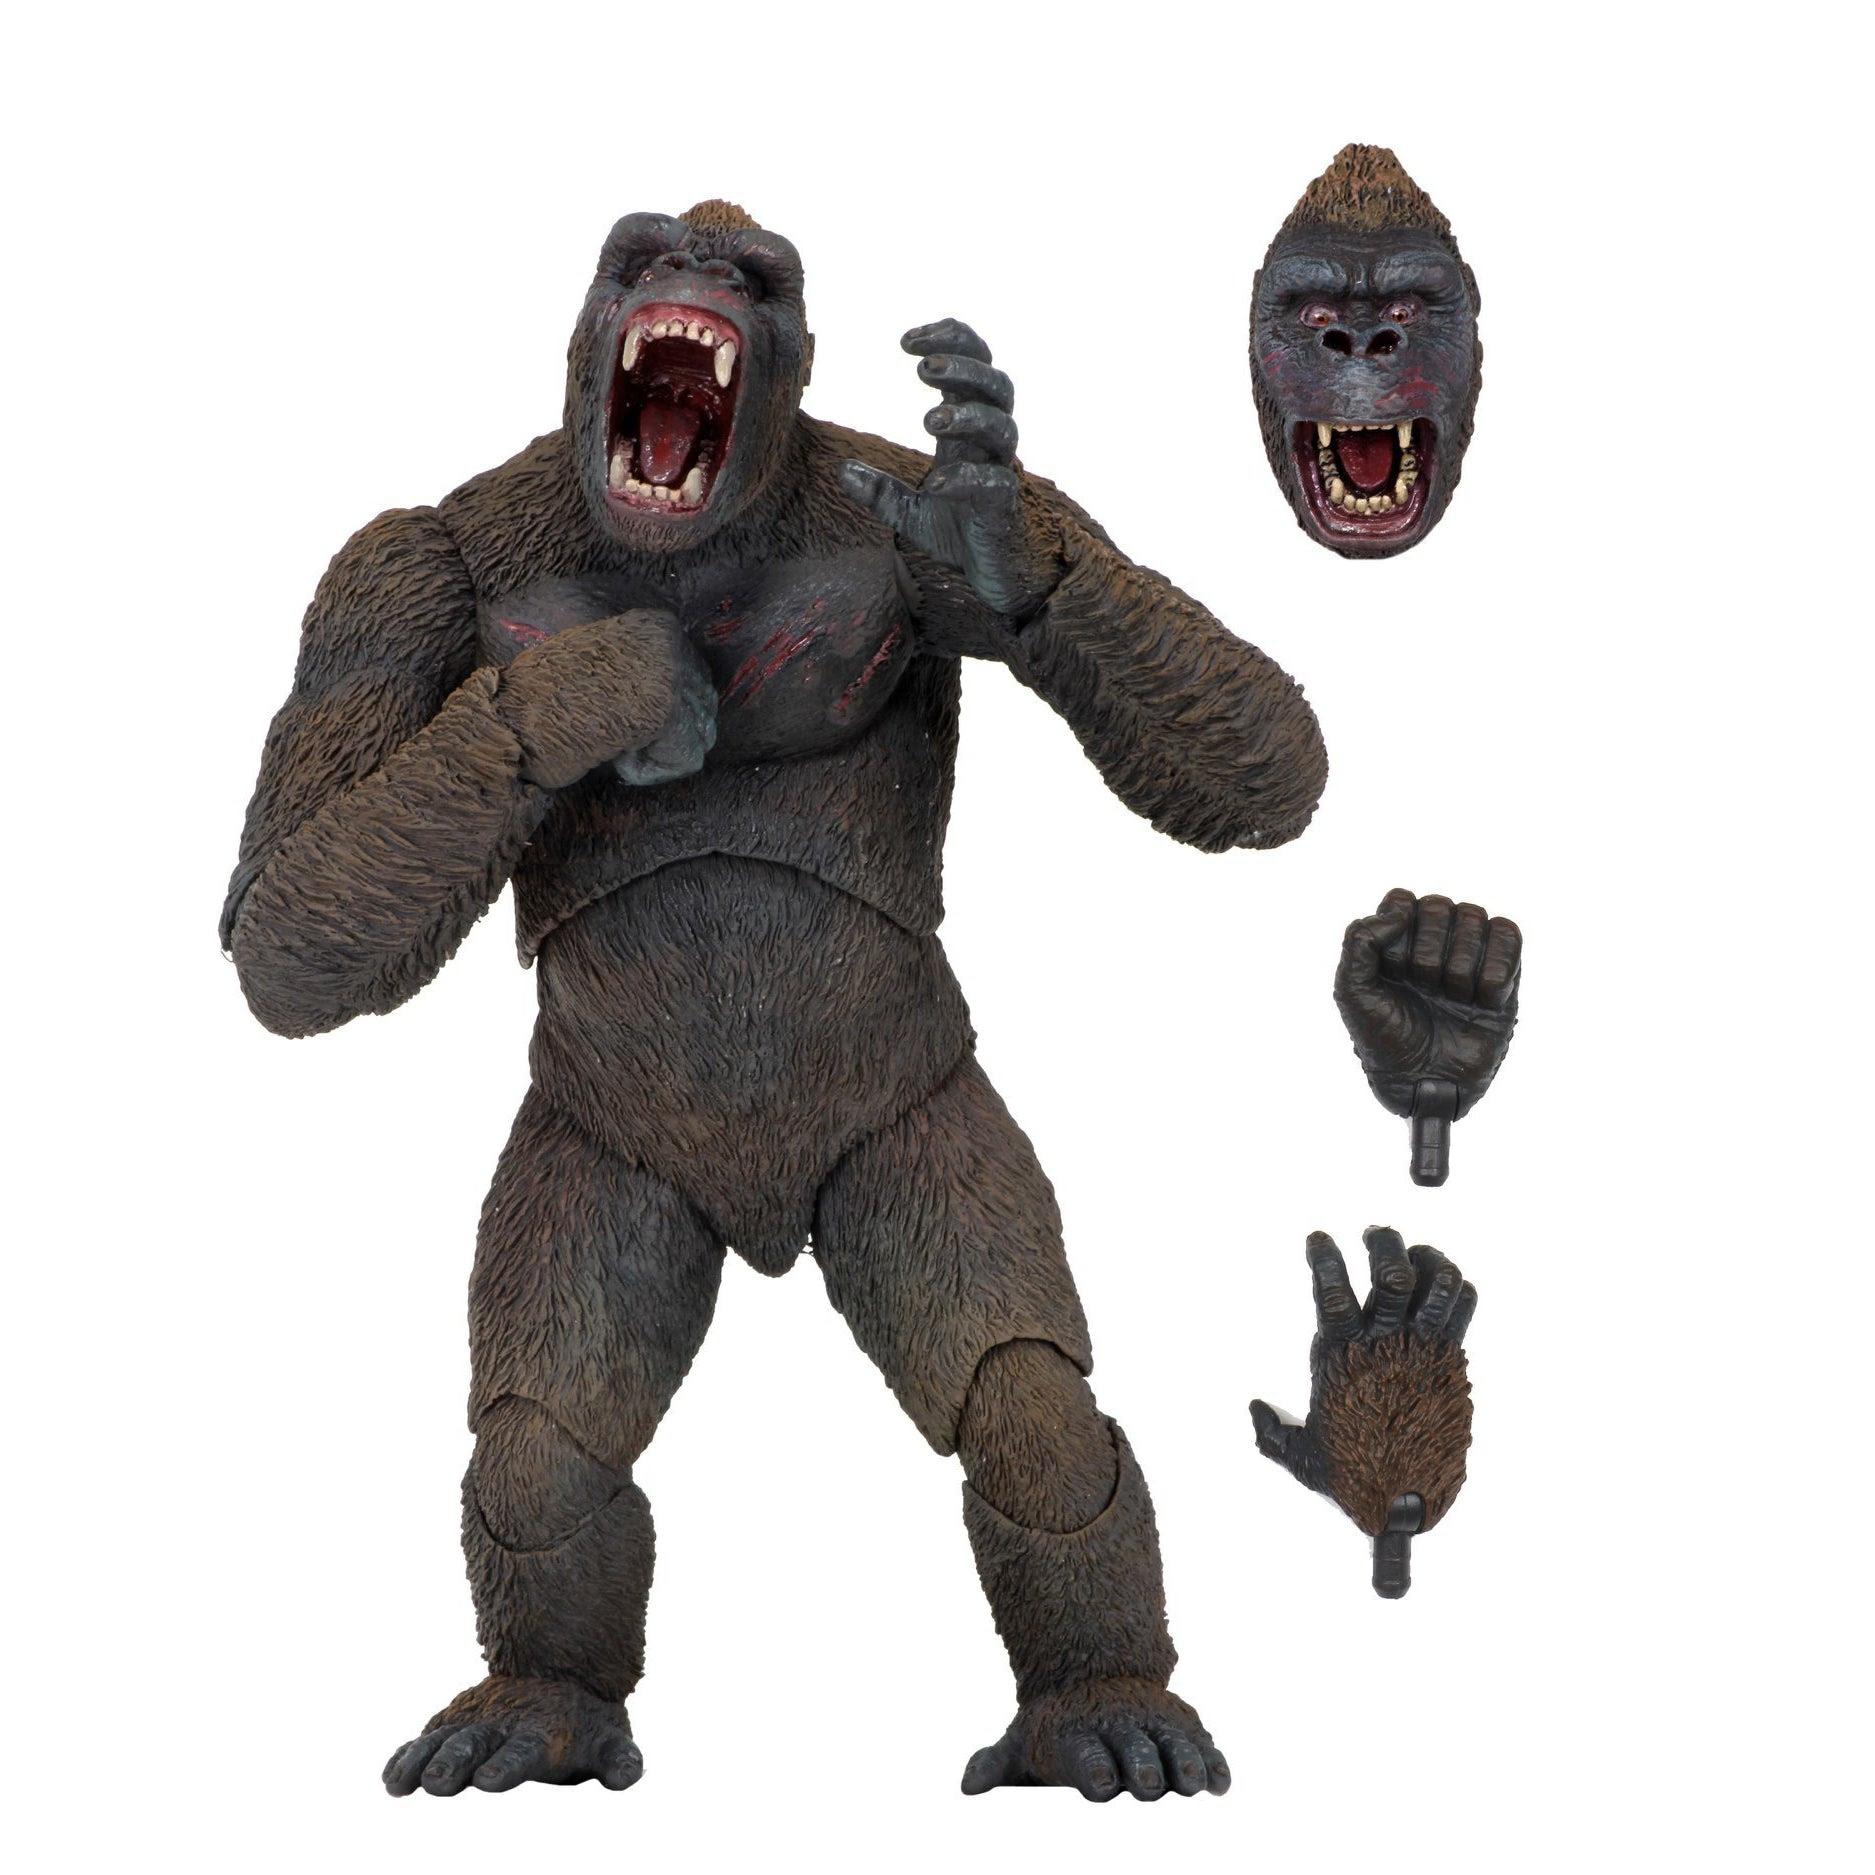 "Image of King Kong 7"" Action Figure - SEPTEMBER 2020"